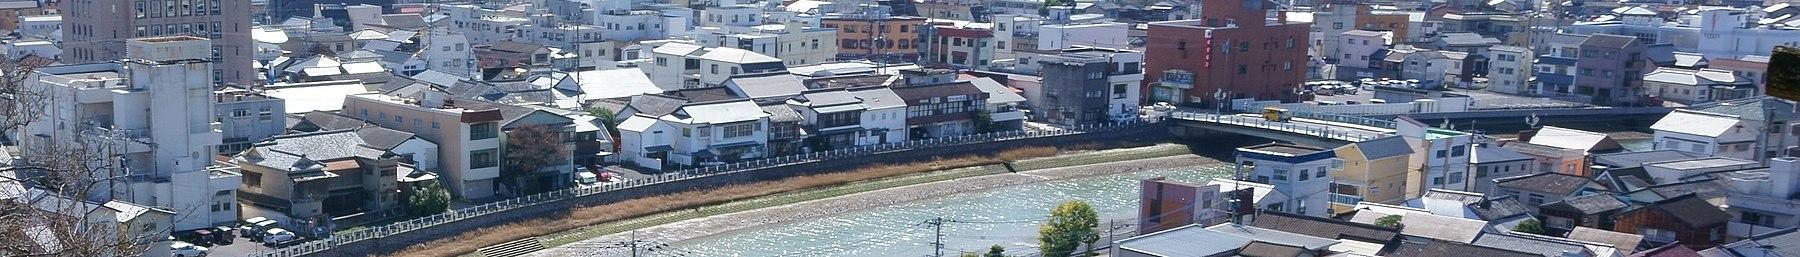 Centre of Imari city from Joyama Park (cropped).jpg